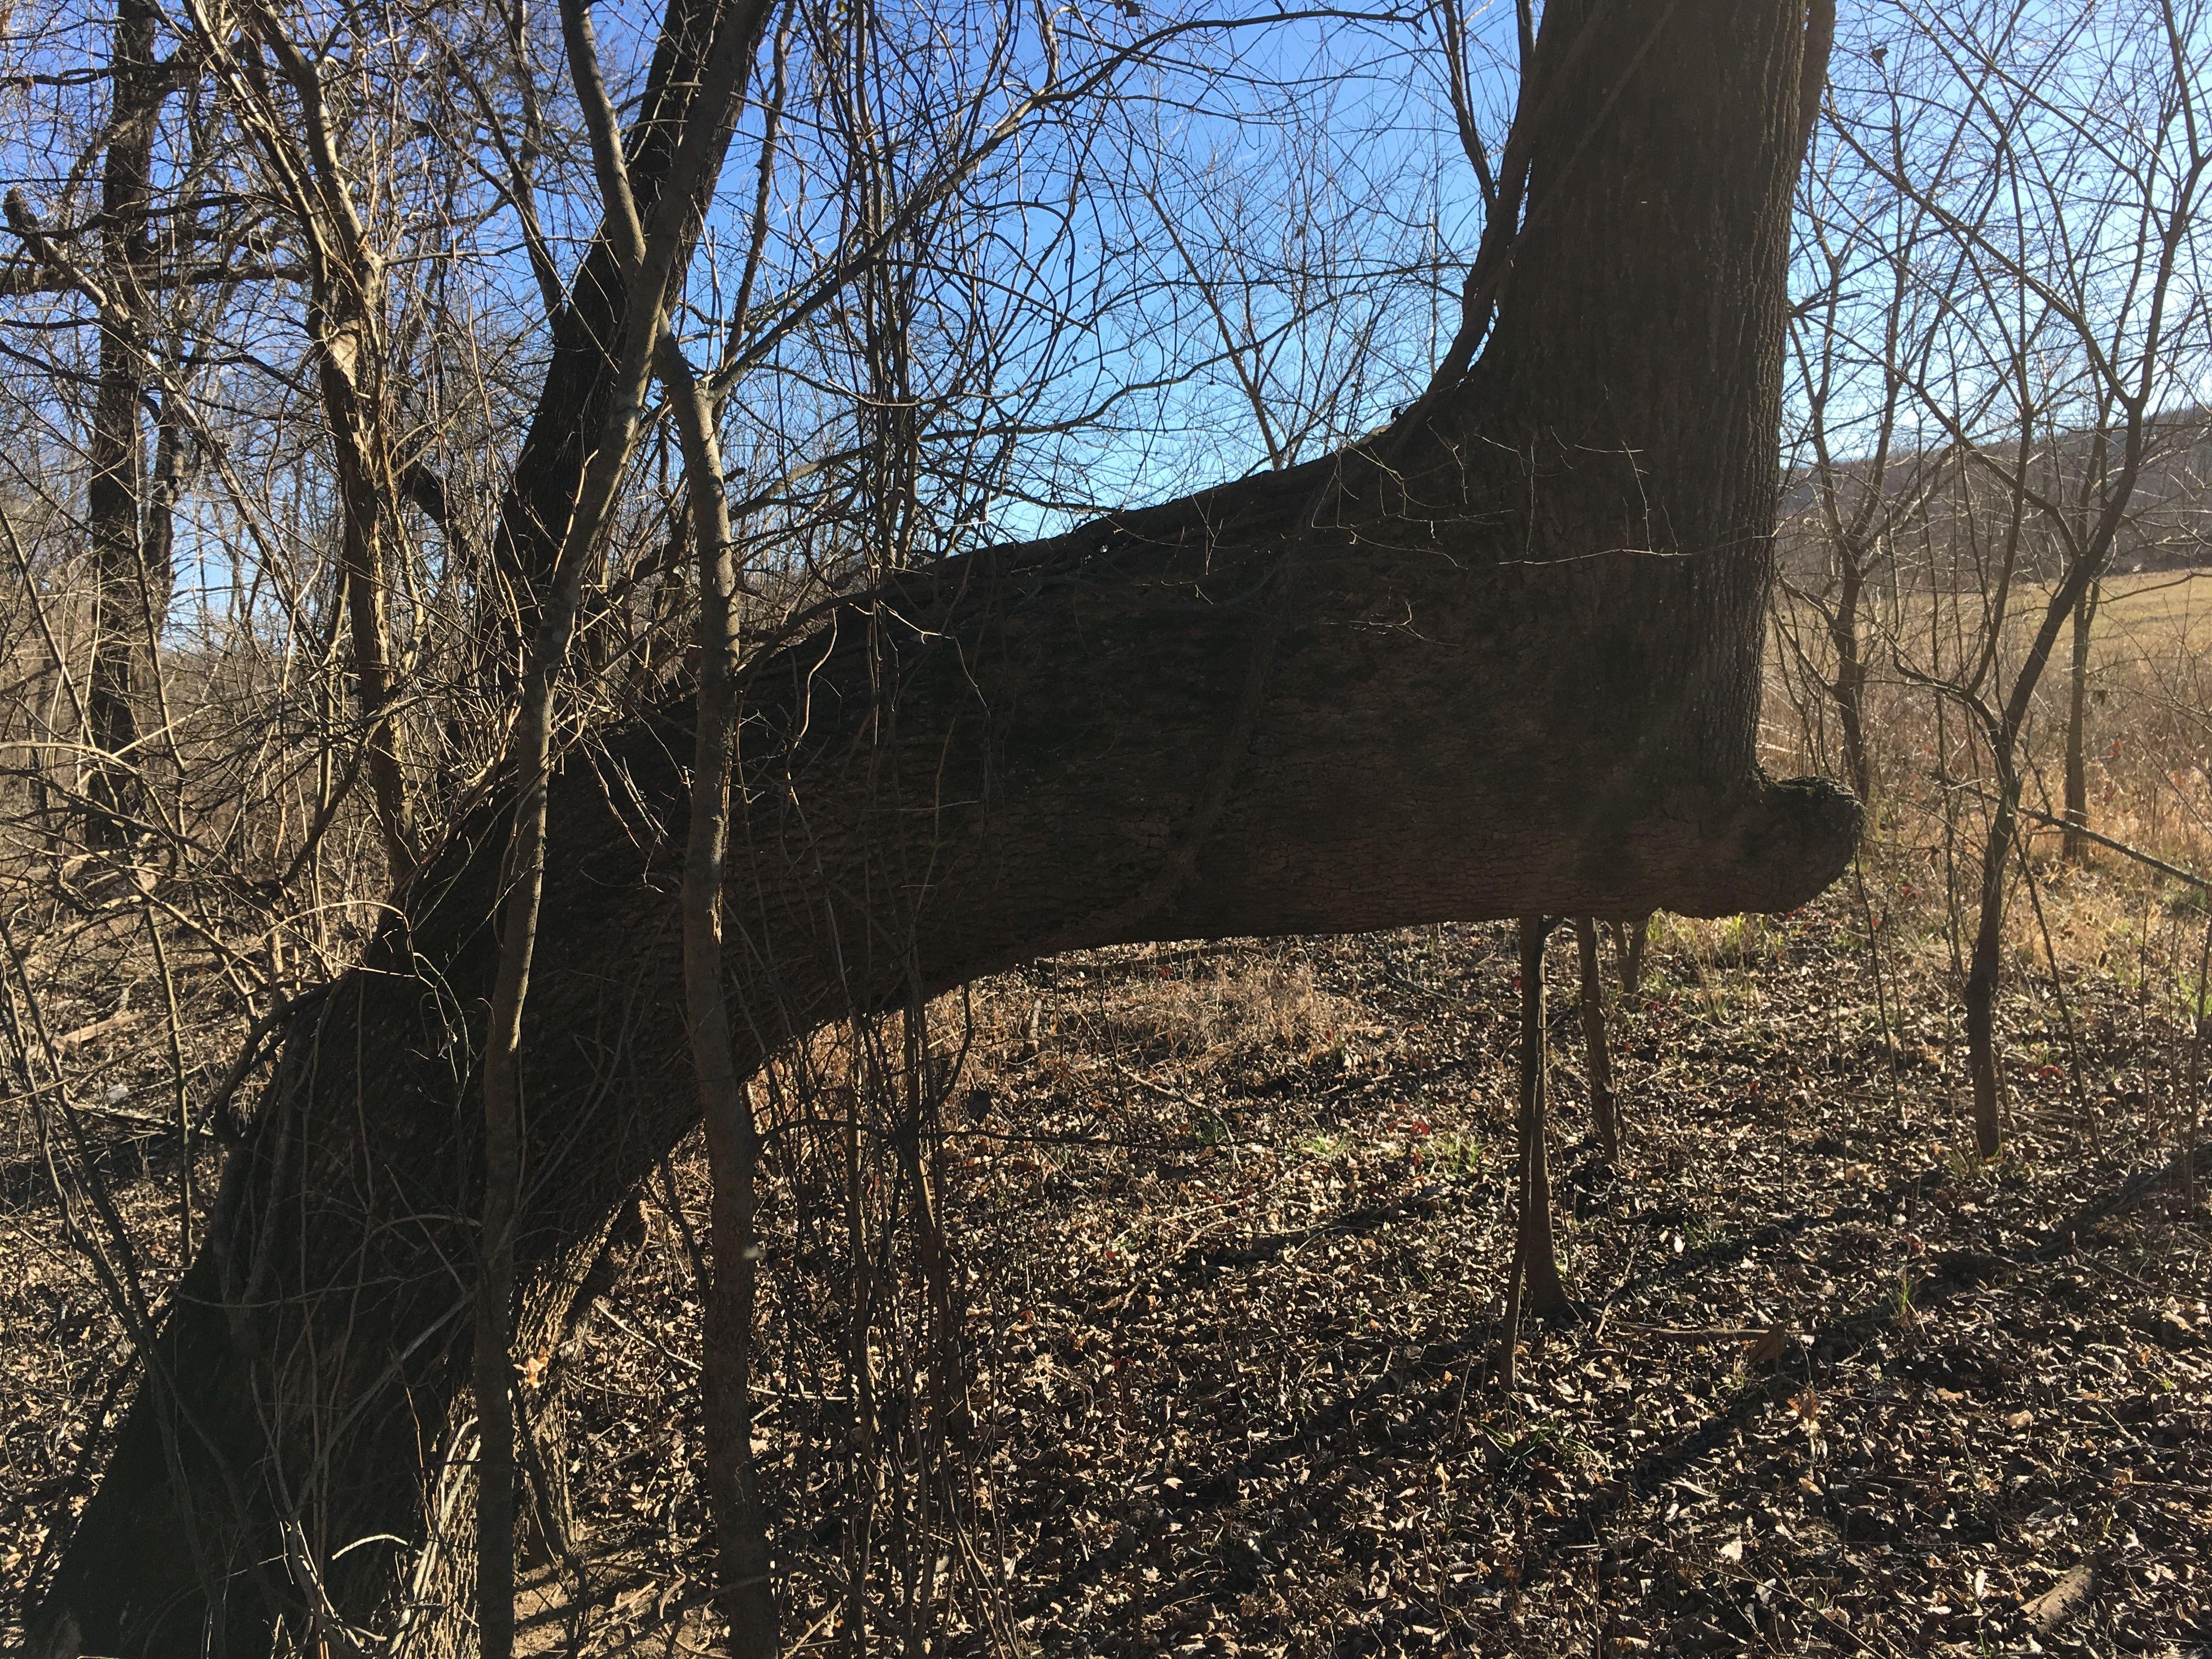 Pin by Sharon Bilgischer on Indian Trail Marker Trees   Pinterest